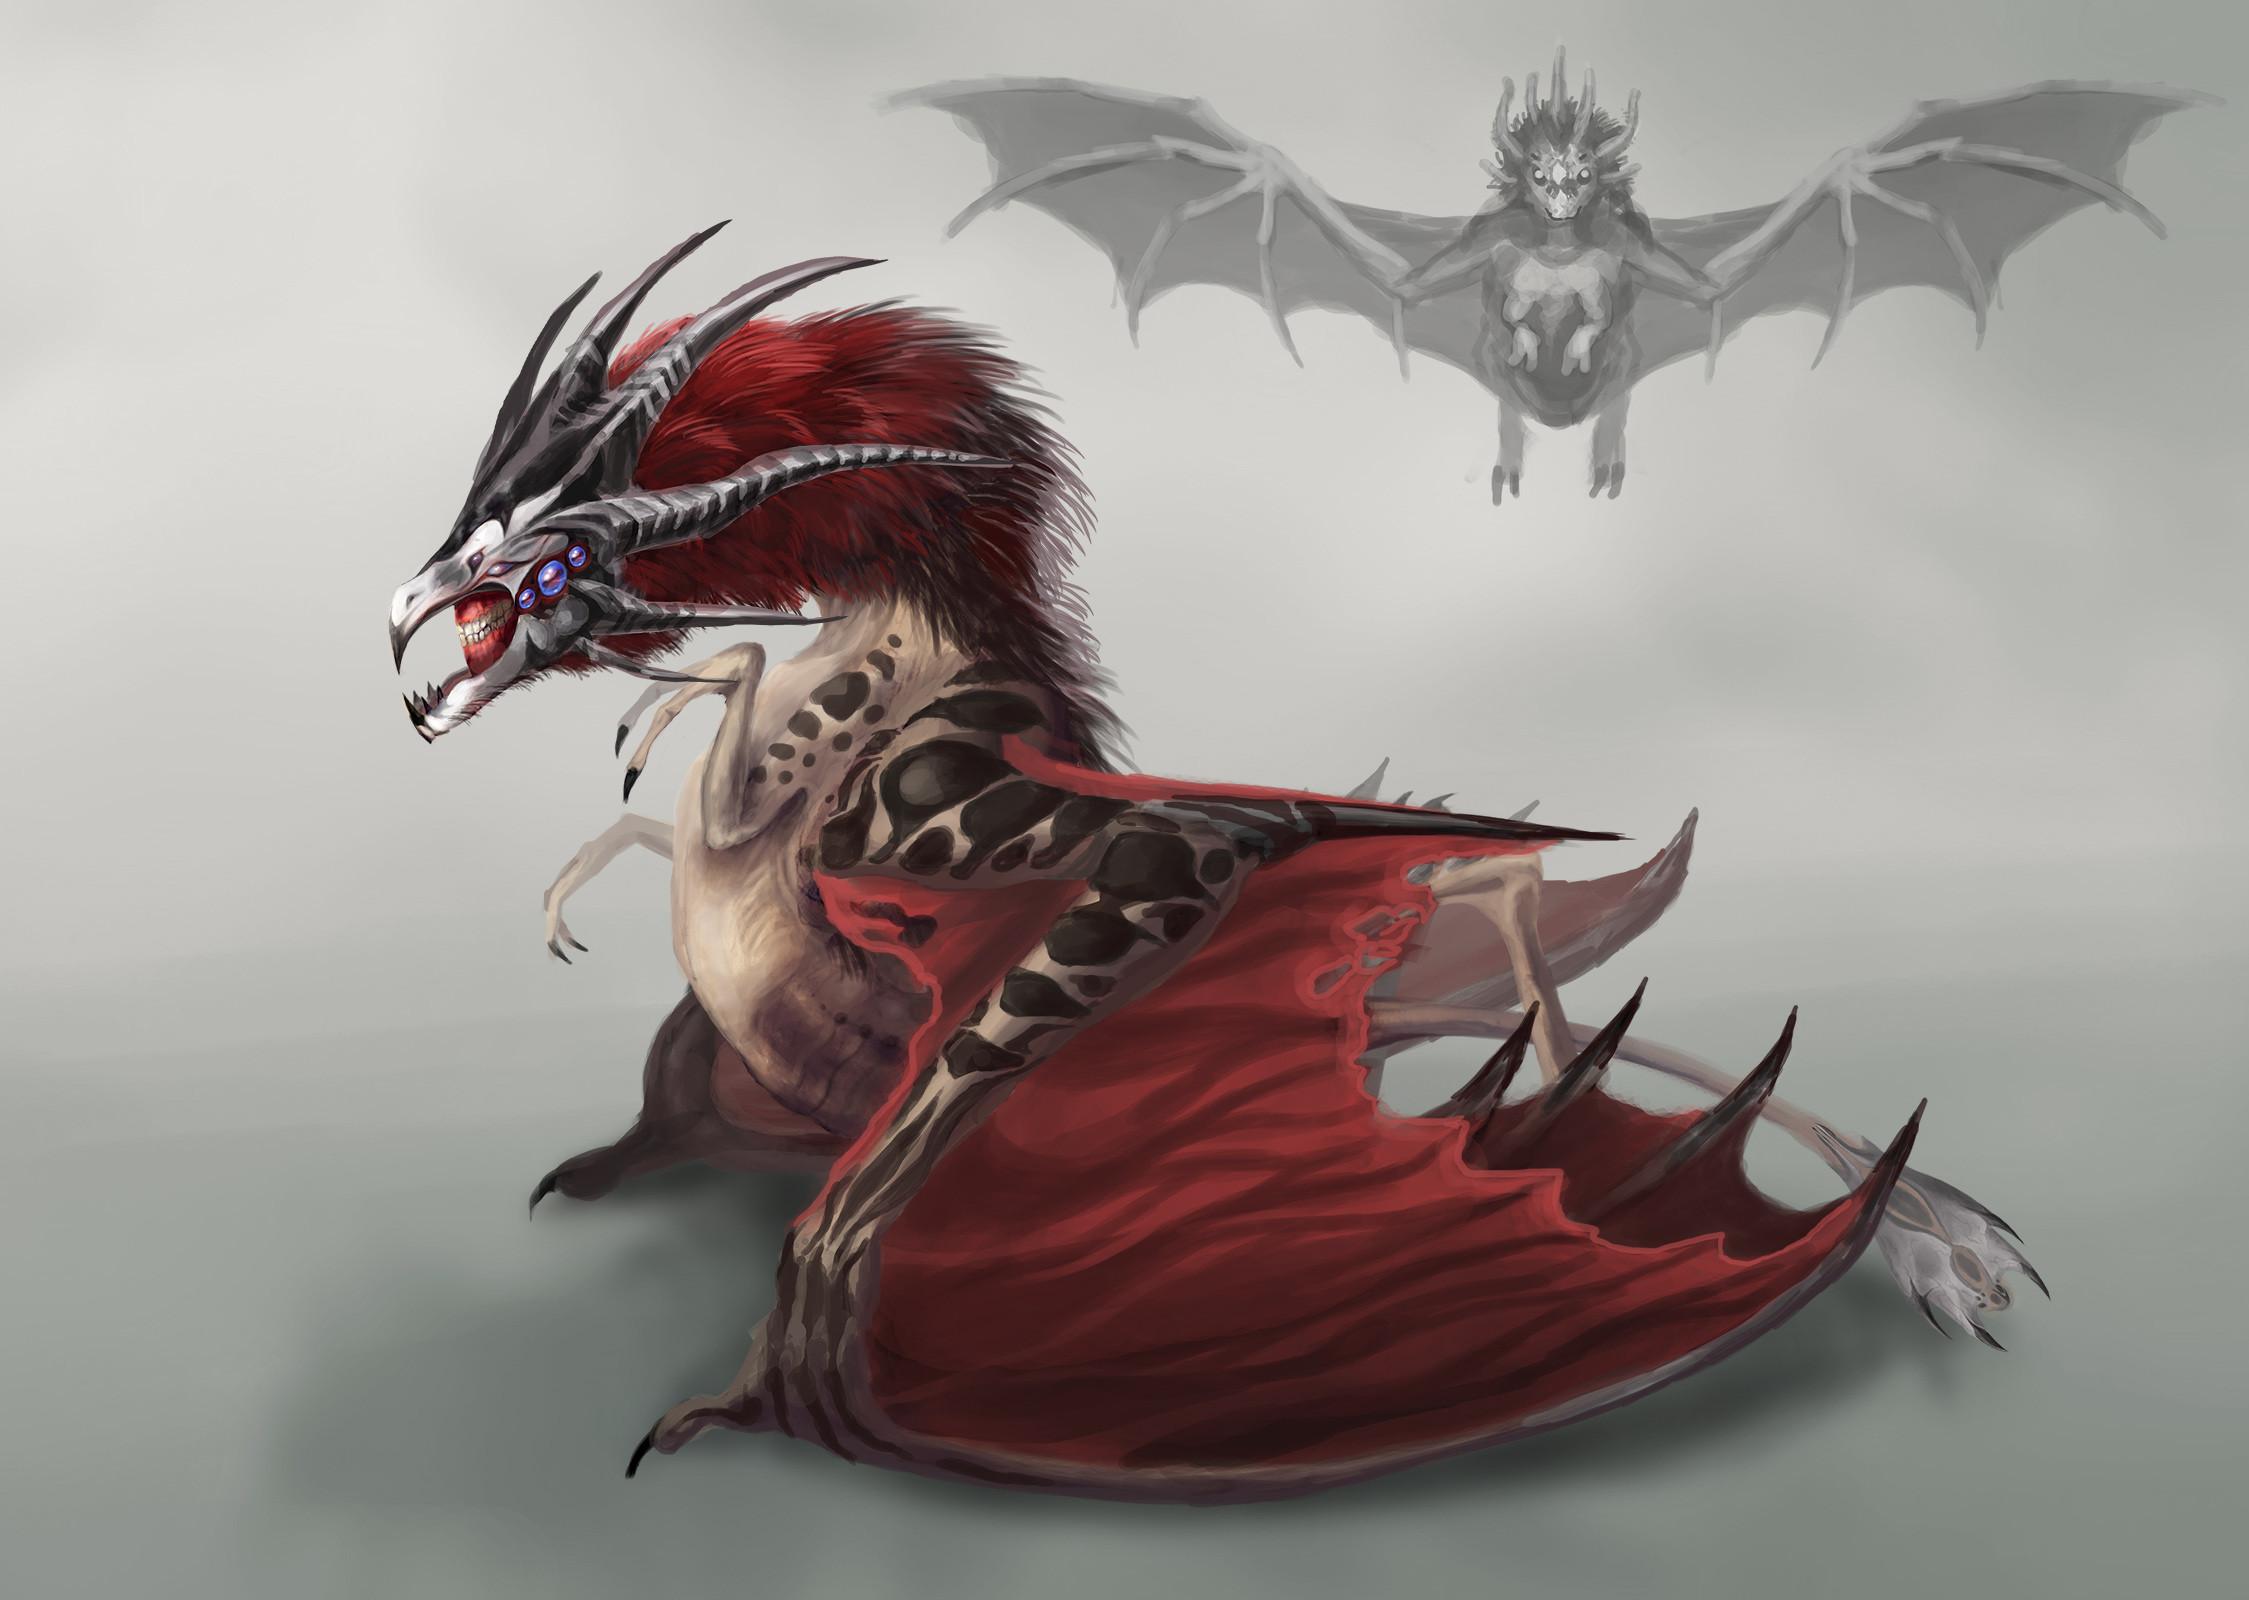 Third alternative stage, Aravyre (female adult) - Revised